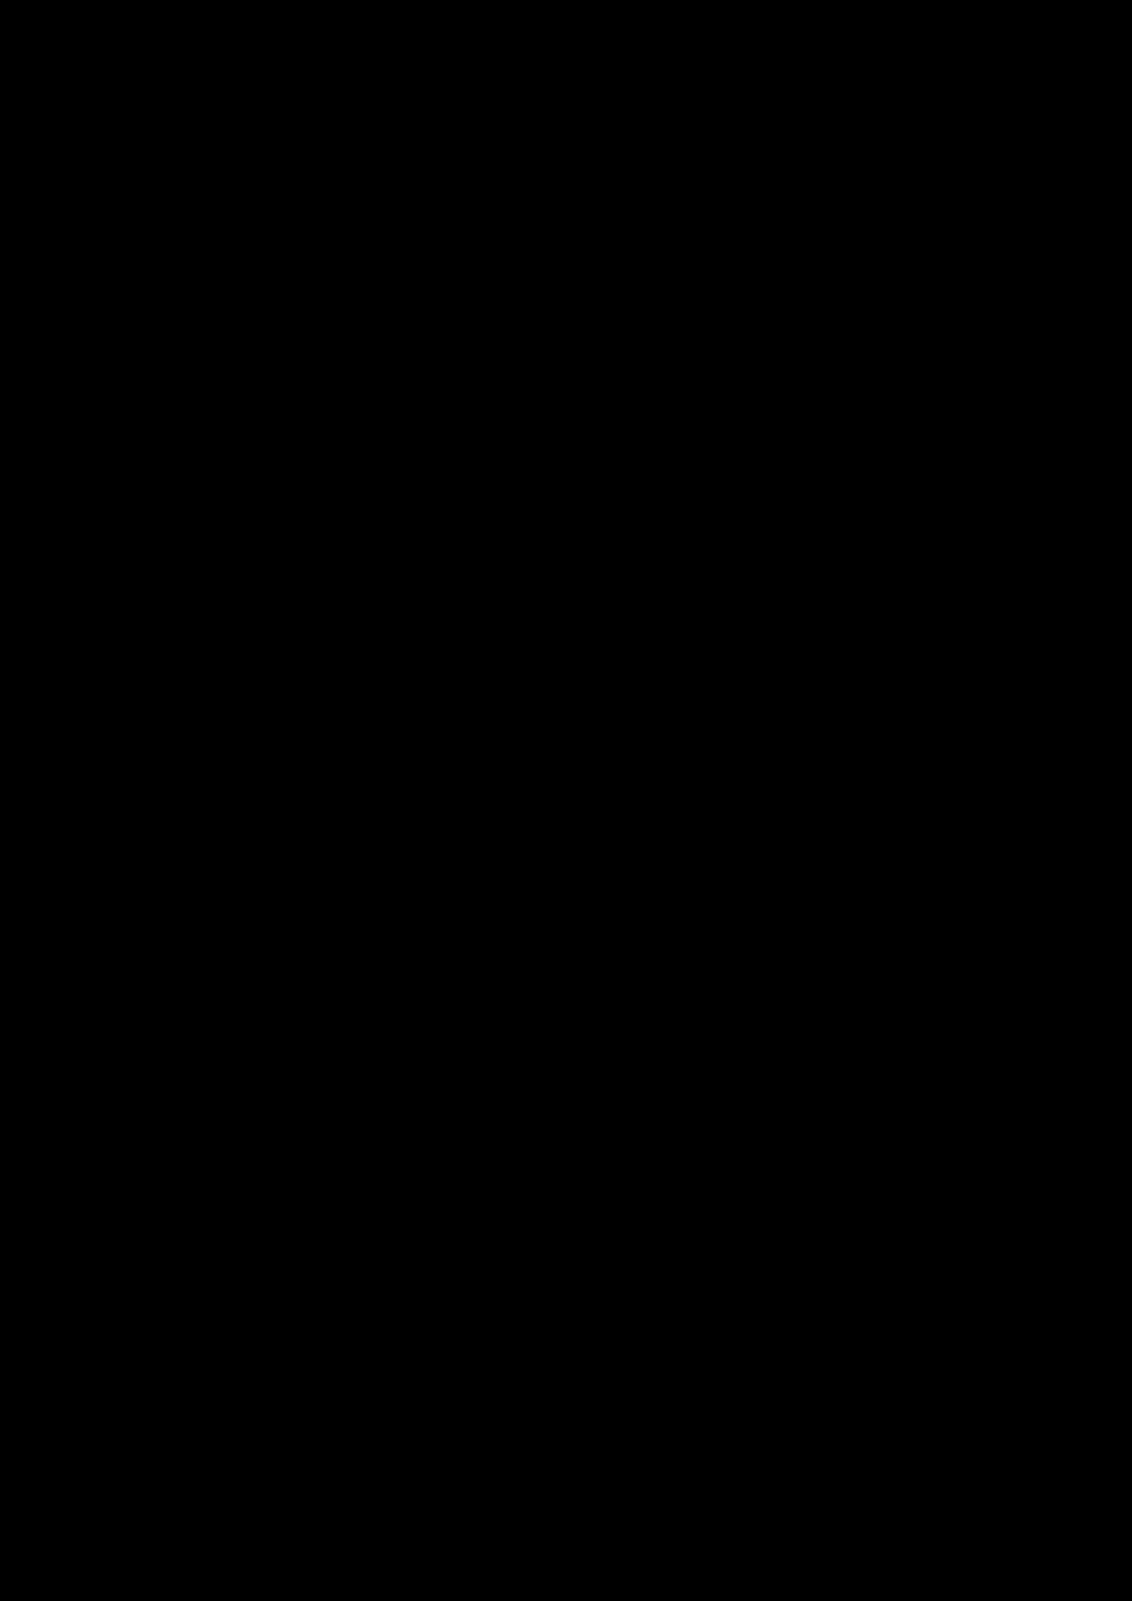 Belyiy sokol slide, Image 173